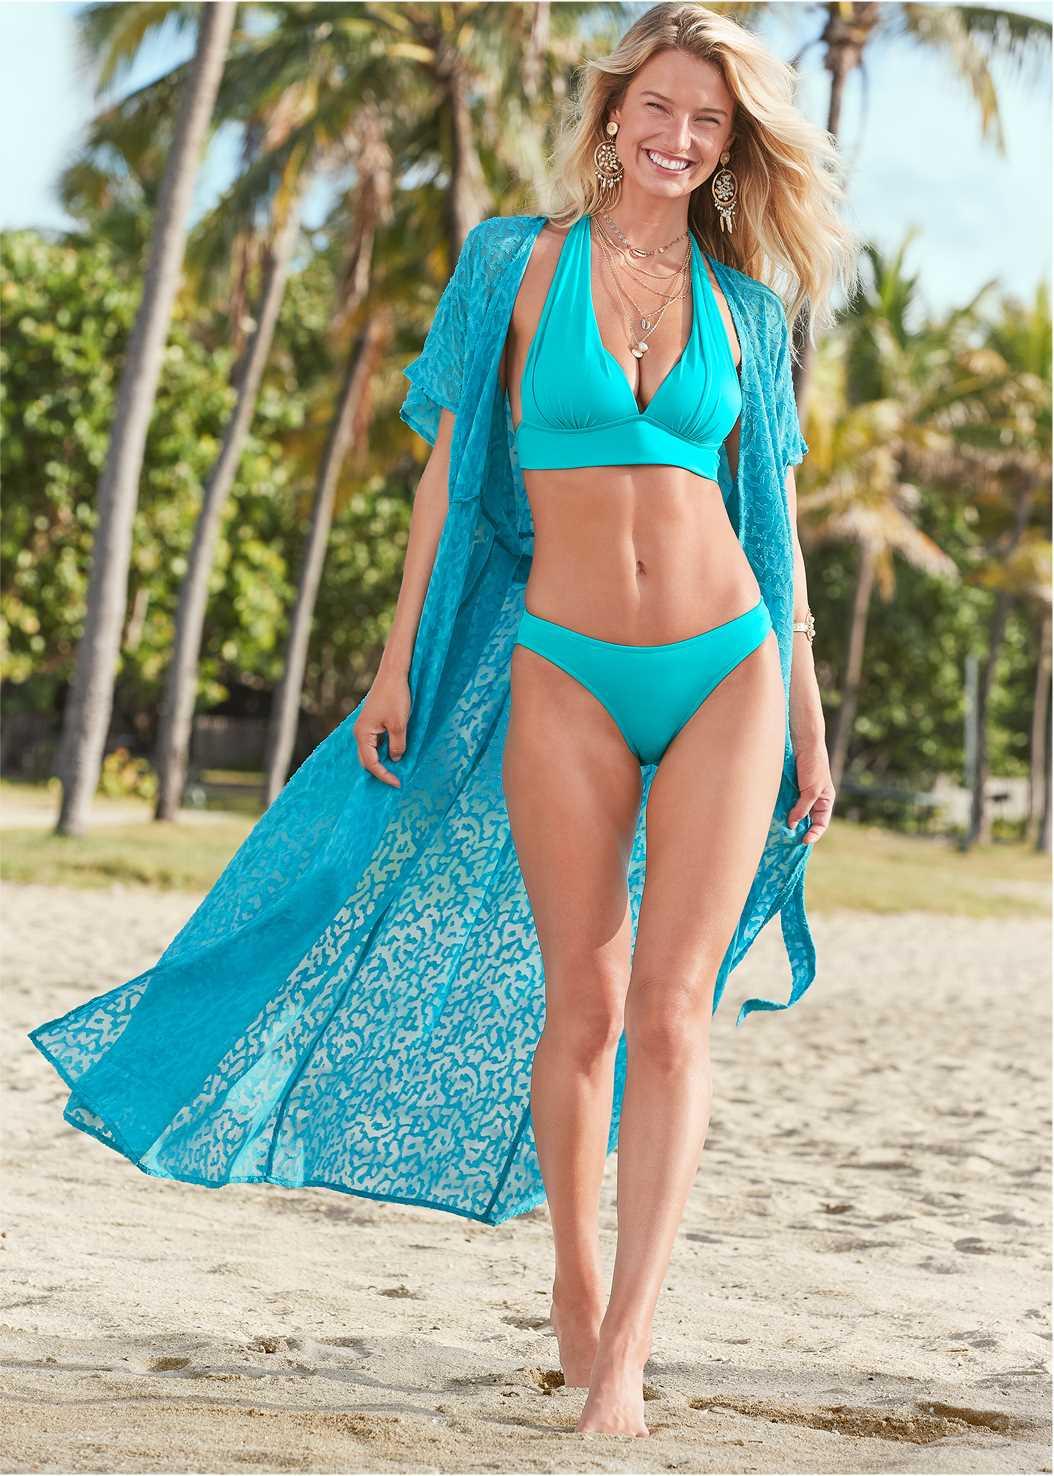 Long Wrap Cover-Up Dress,Underwire Halter Bikini Top,Scoop Front Classic Bikini Bottom